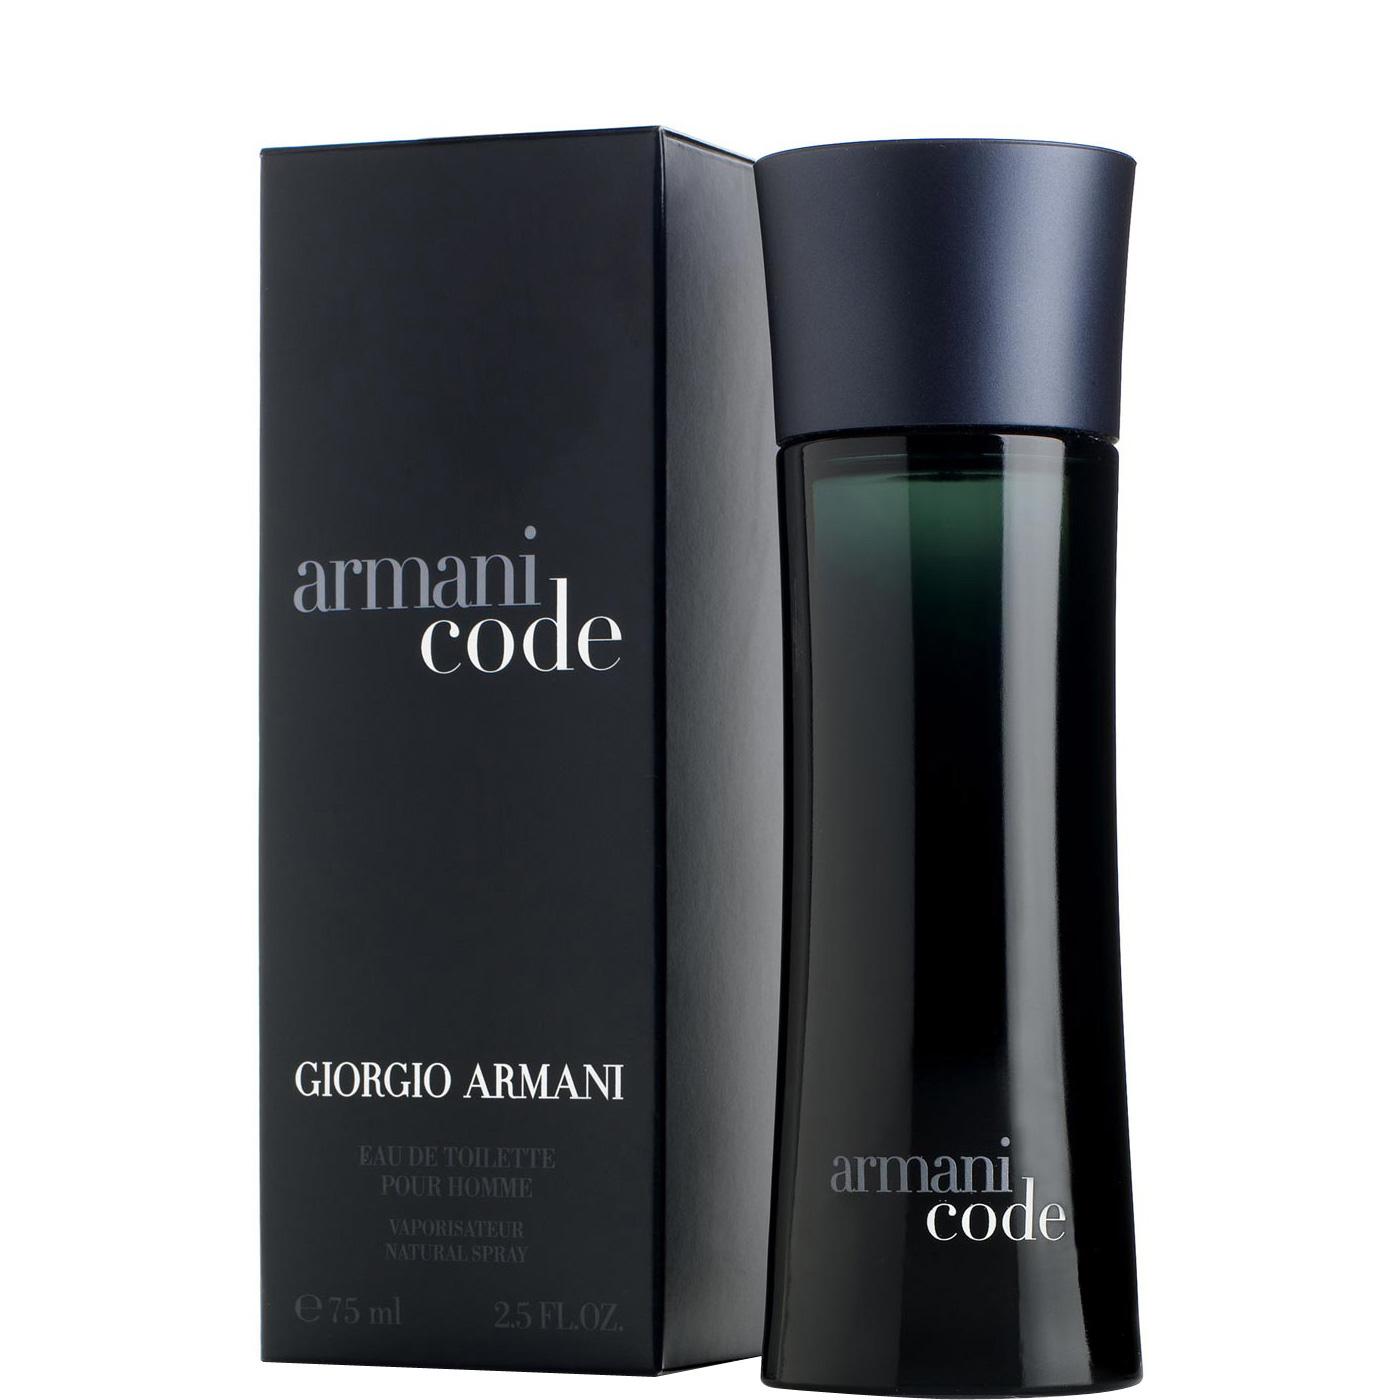 купить мужские духи Giorgio Armani Armani Code в минске